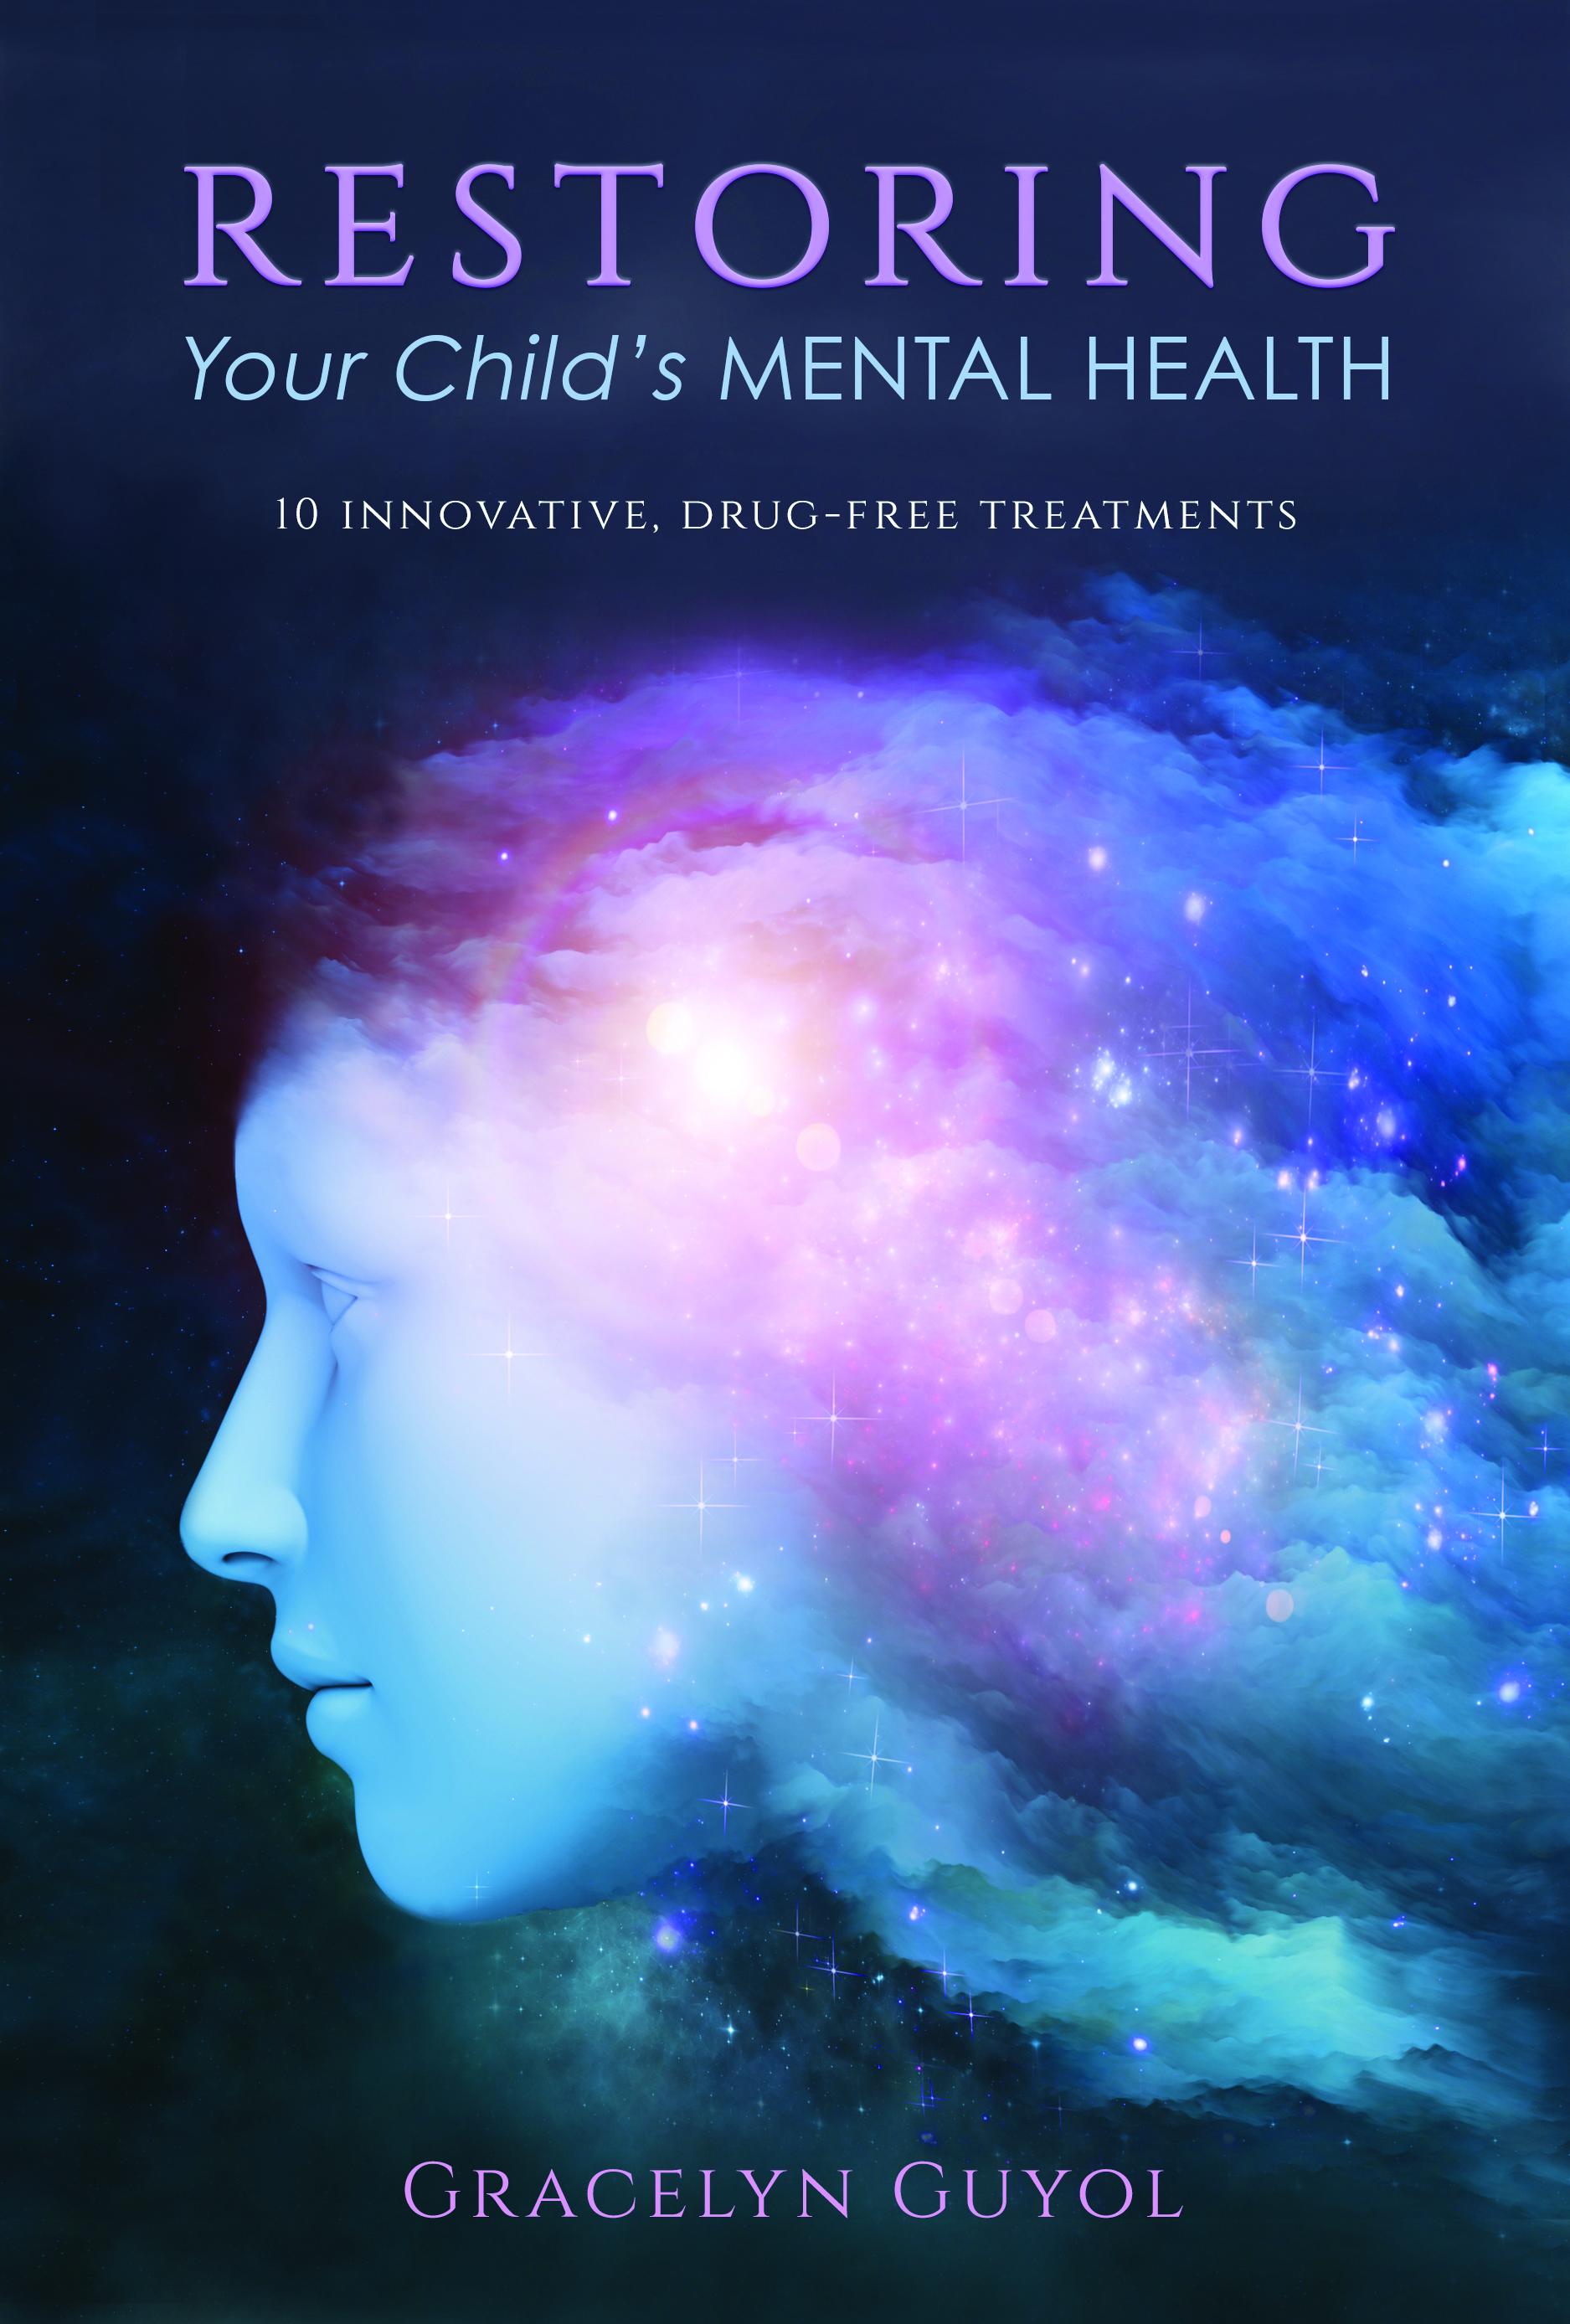 gracelyn restoring your childs mental health book cover 6 x 9 cmyk for spirit of change.jpg